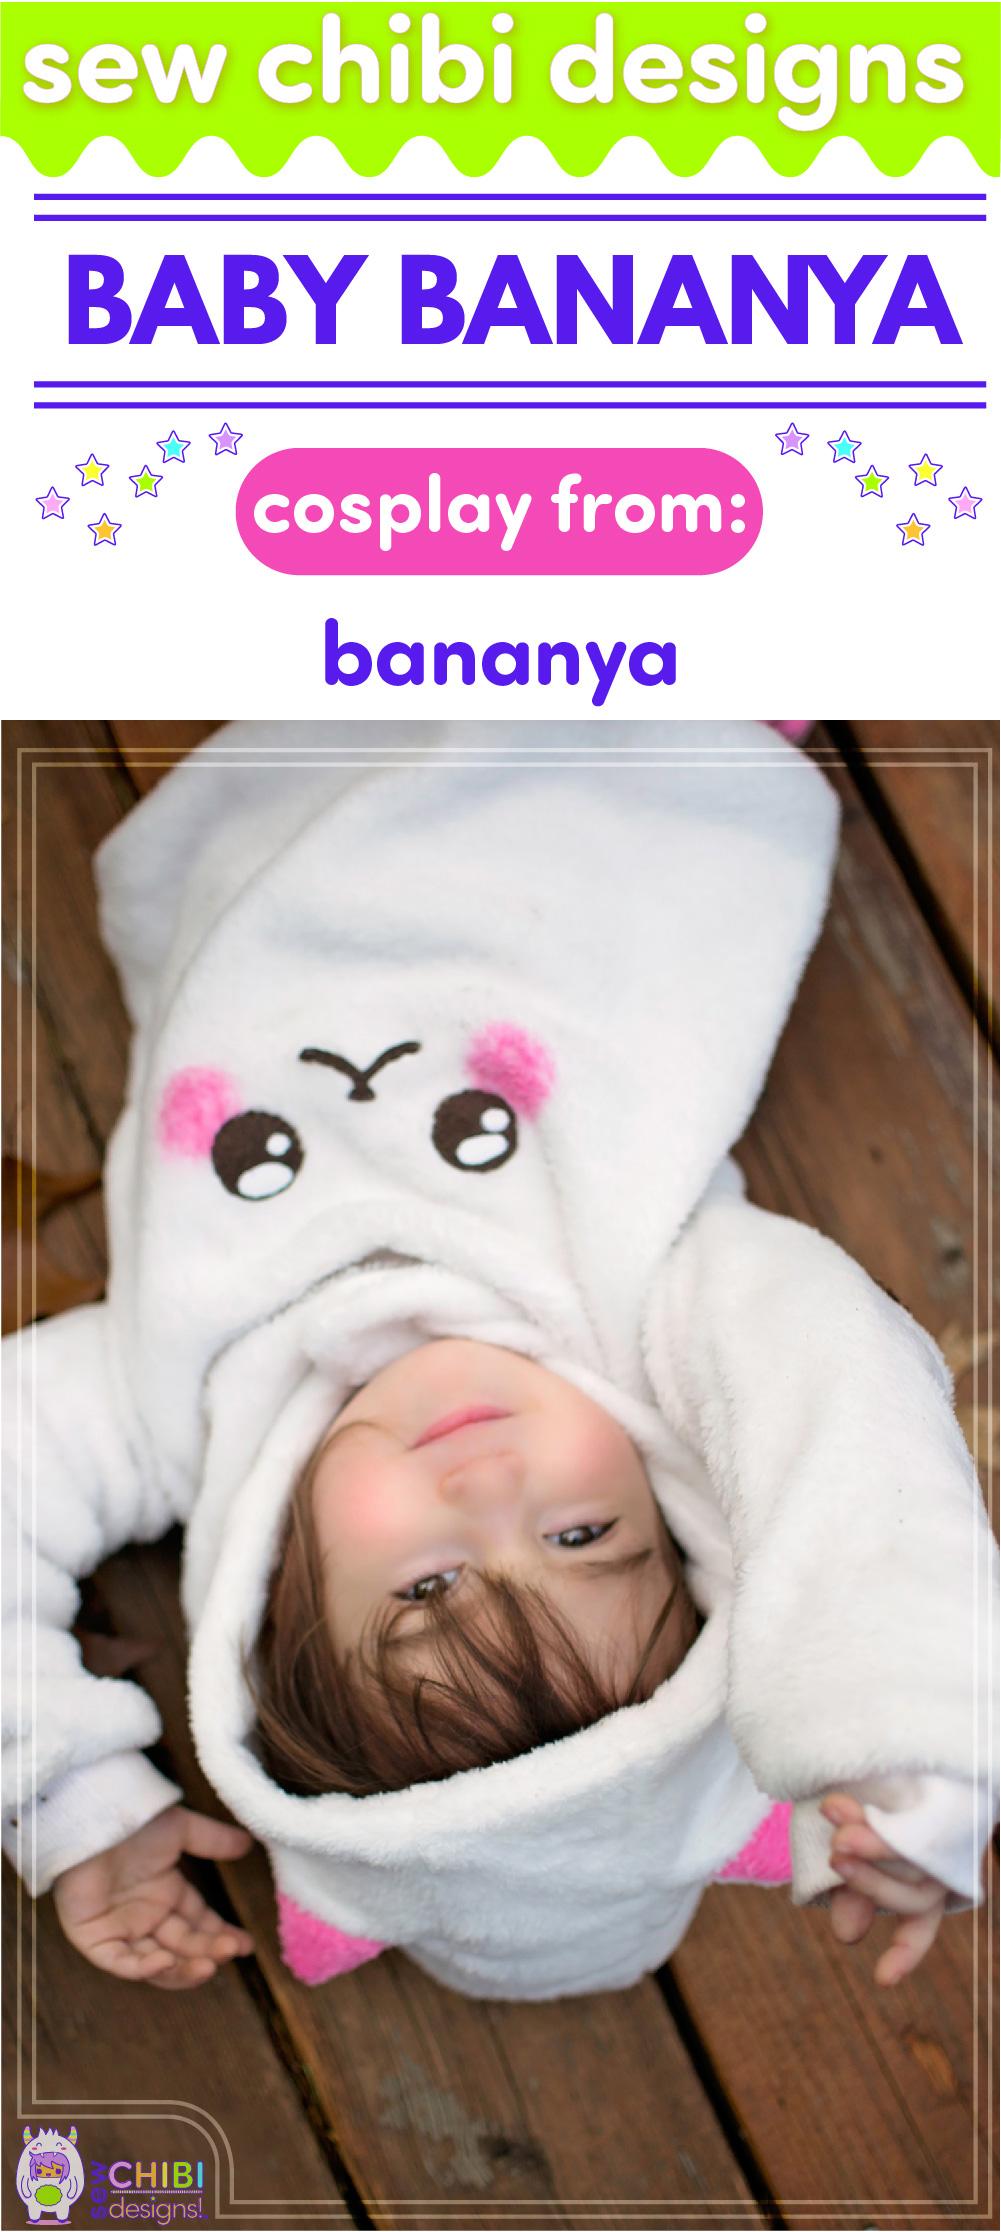 Baby Bananya chibi cosplay from Crunchyroll's Bananya ( ���ゃ ) sewn by Sew Chibi Designs for Sew Geeky